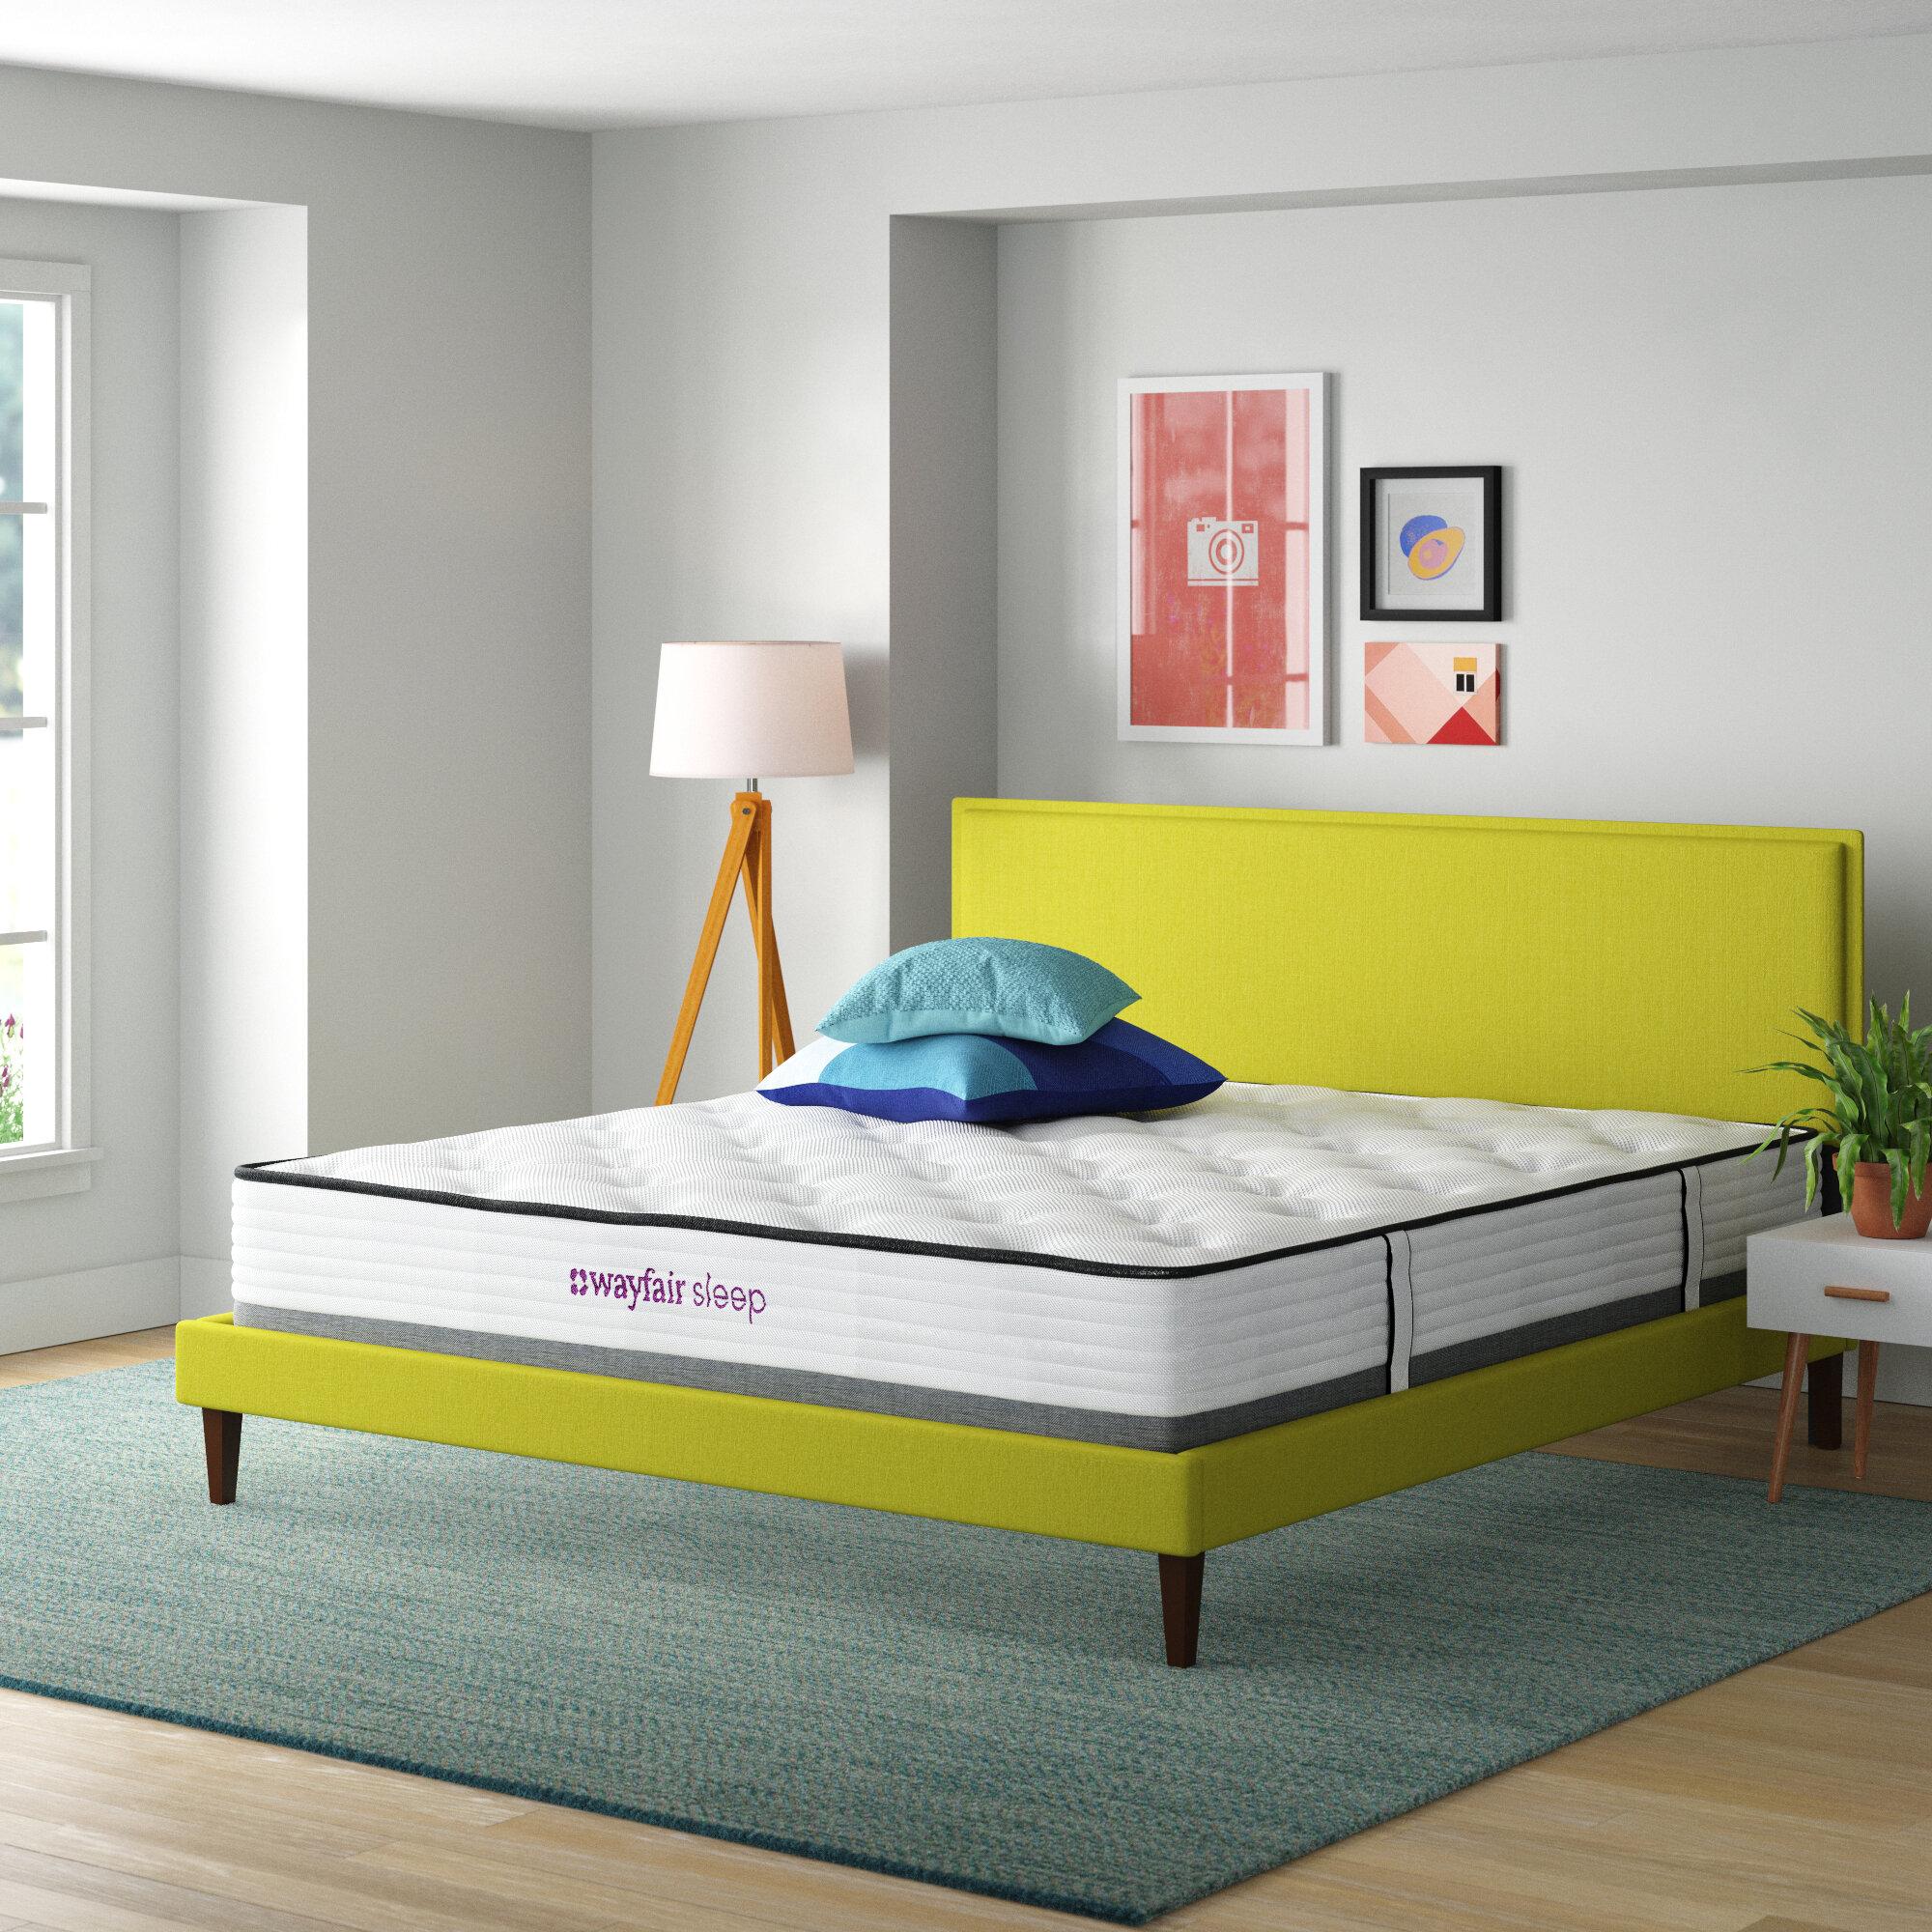 Wayfair Sleep 12 Medium Plush Hybrid Mattress Reviews Wayfair